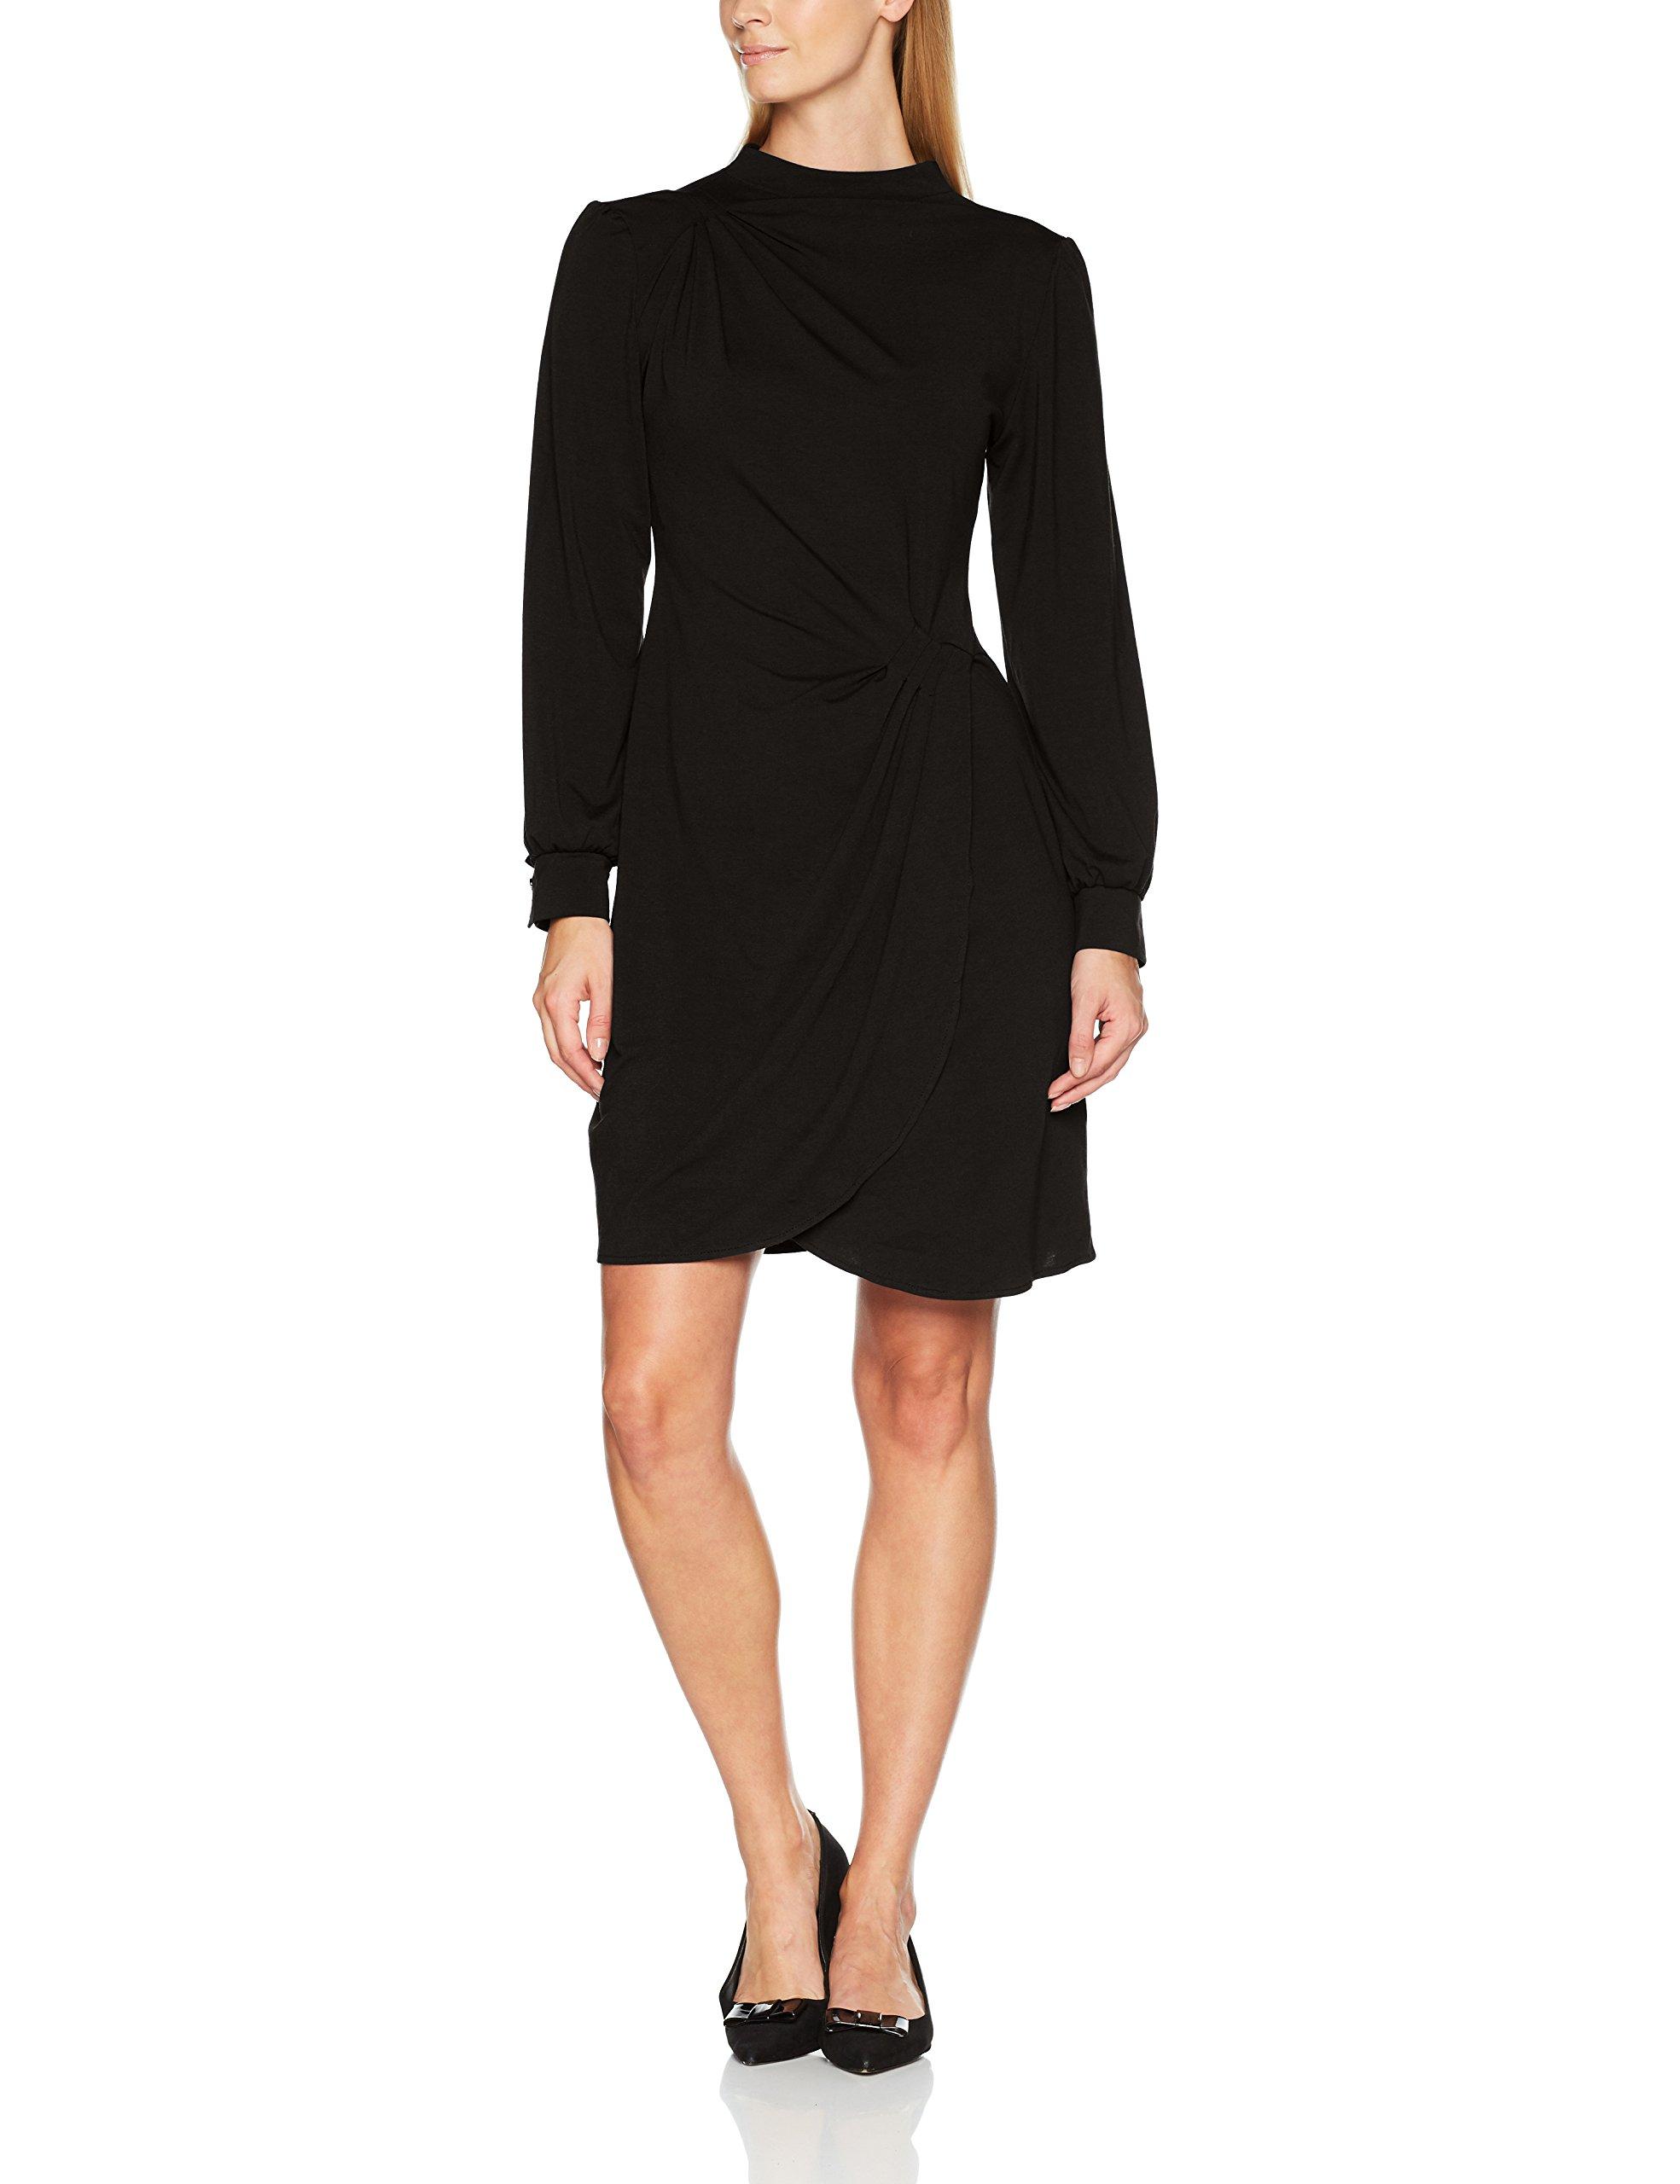 Dress RobeNoirblack Femme Hotsquash Agnes 6046 WEDIH2Y9